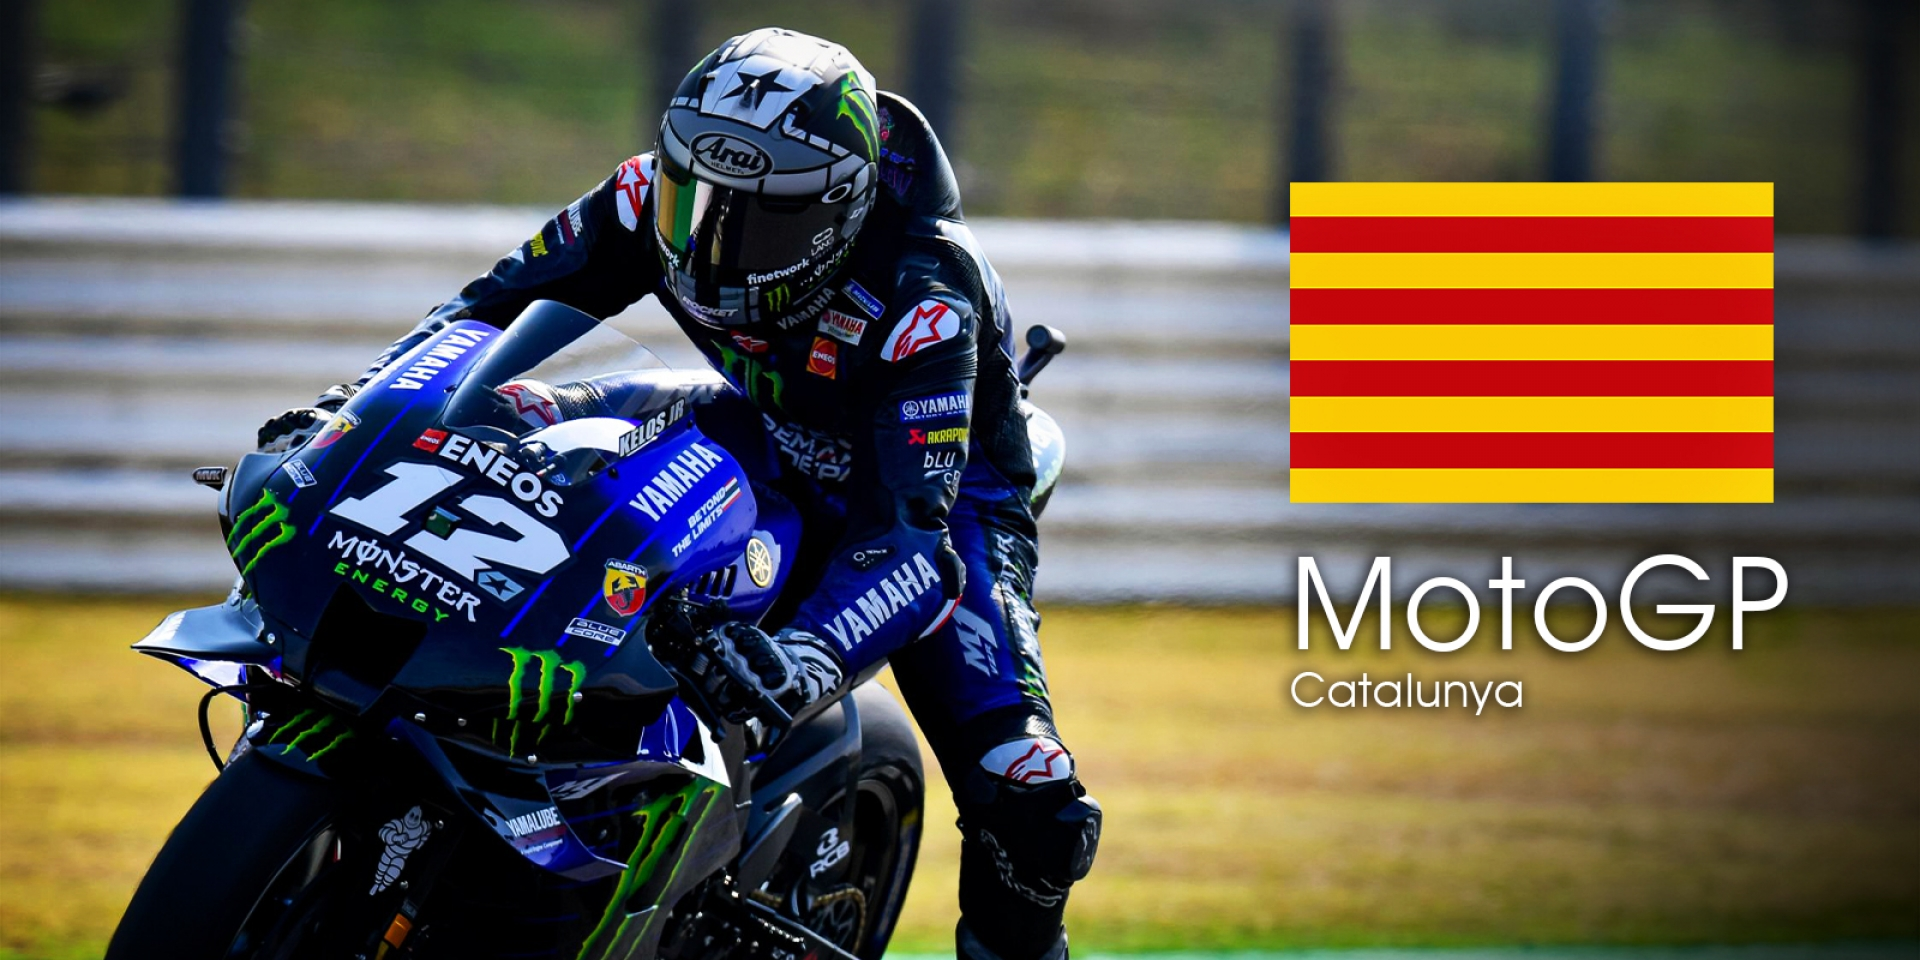 MotoGP 2020 加泰隆尼亞站 轉播時間